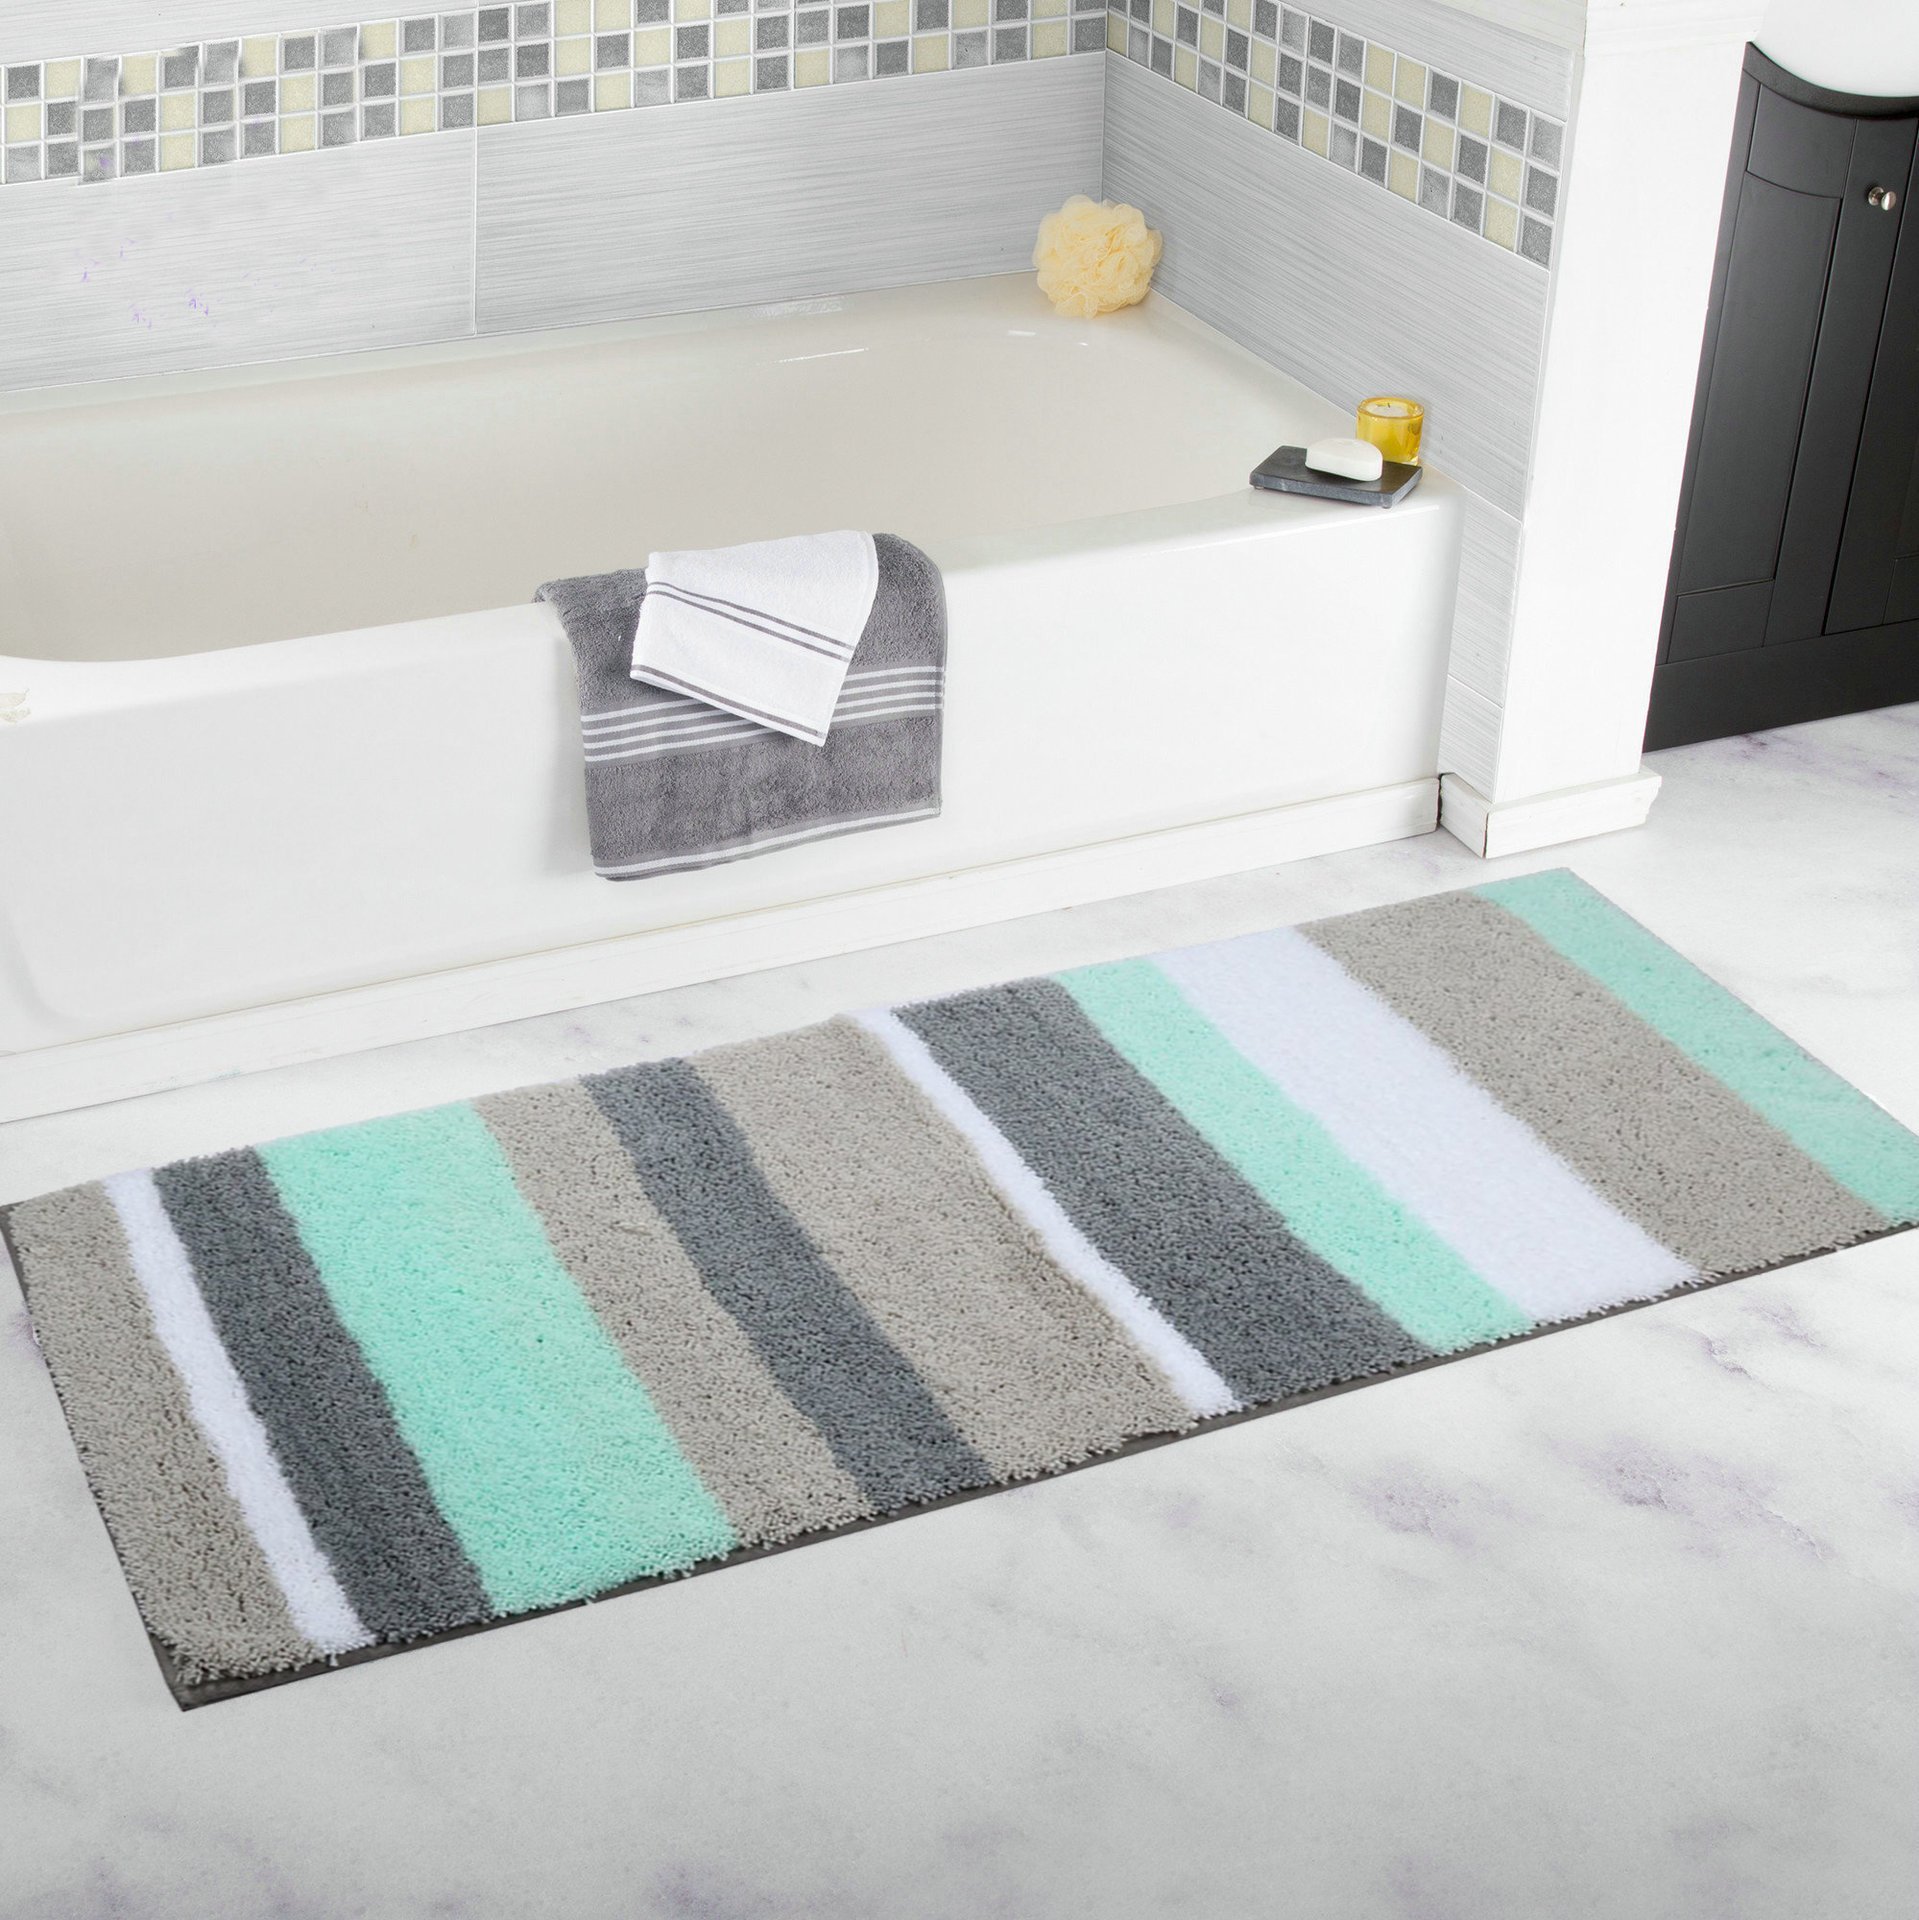 Cheap Bathroom Rug Runner 24x60 Find Bathroom Rug Runner 24x60 Deals On Line At Alibaba Com